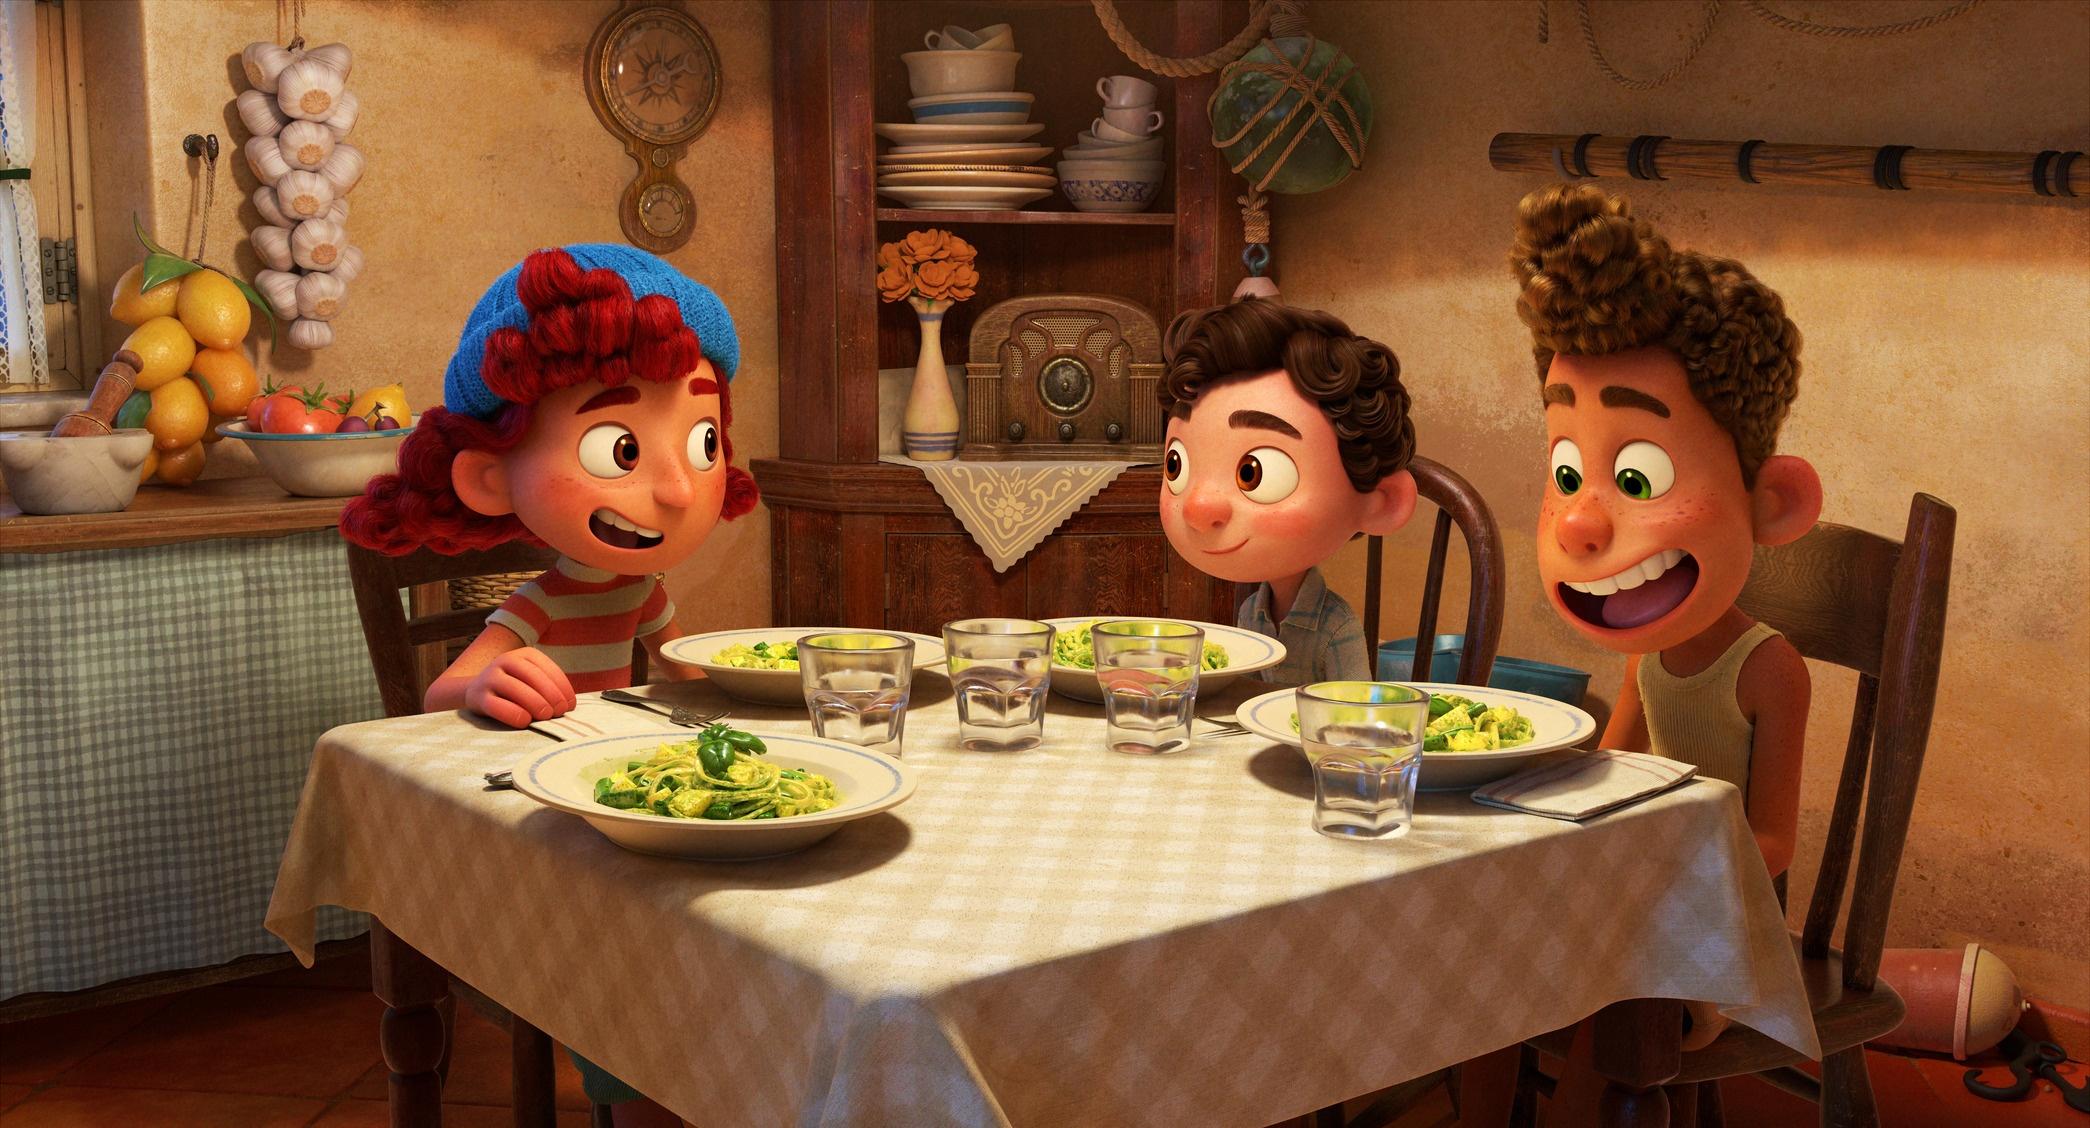 Luca recensione film d'animazione Disney Pixar di Enrico Casarosa